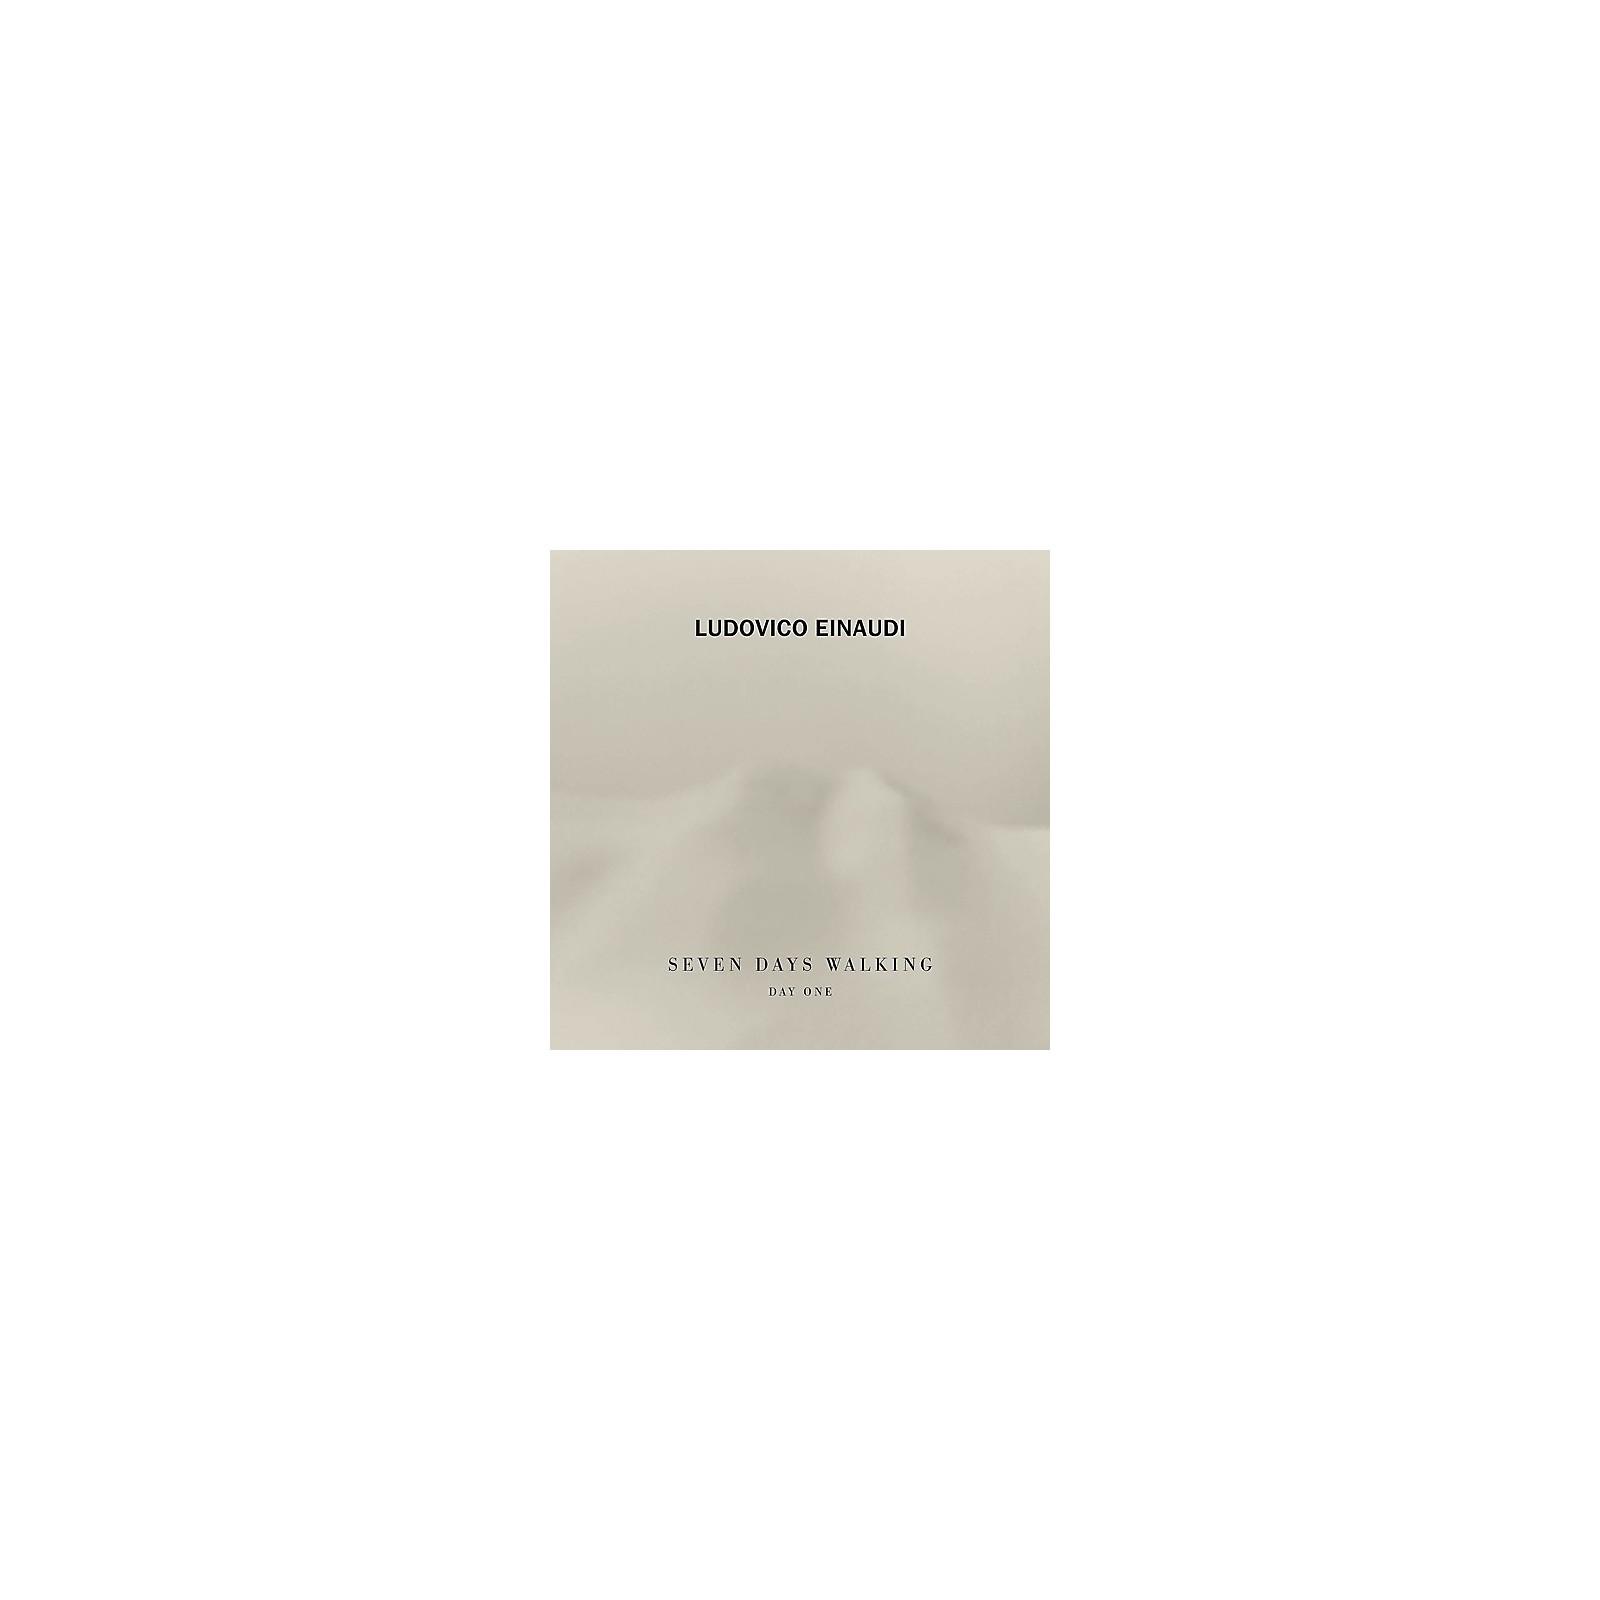 Alliance Ludovico Einaudi - Seven Days Walking: Day 1